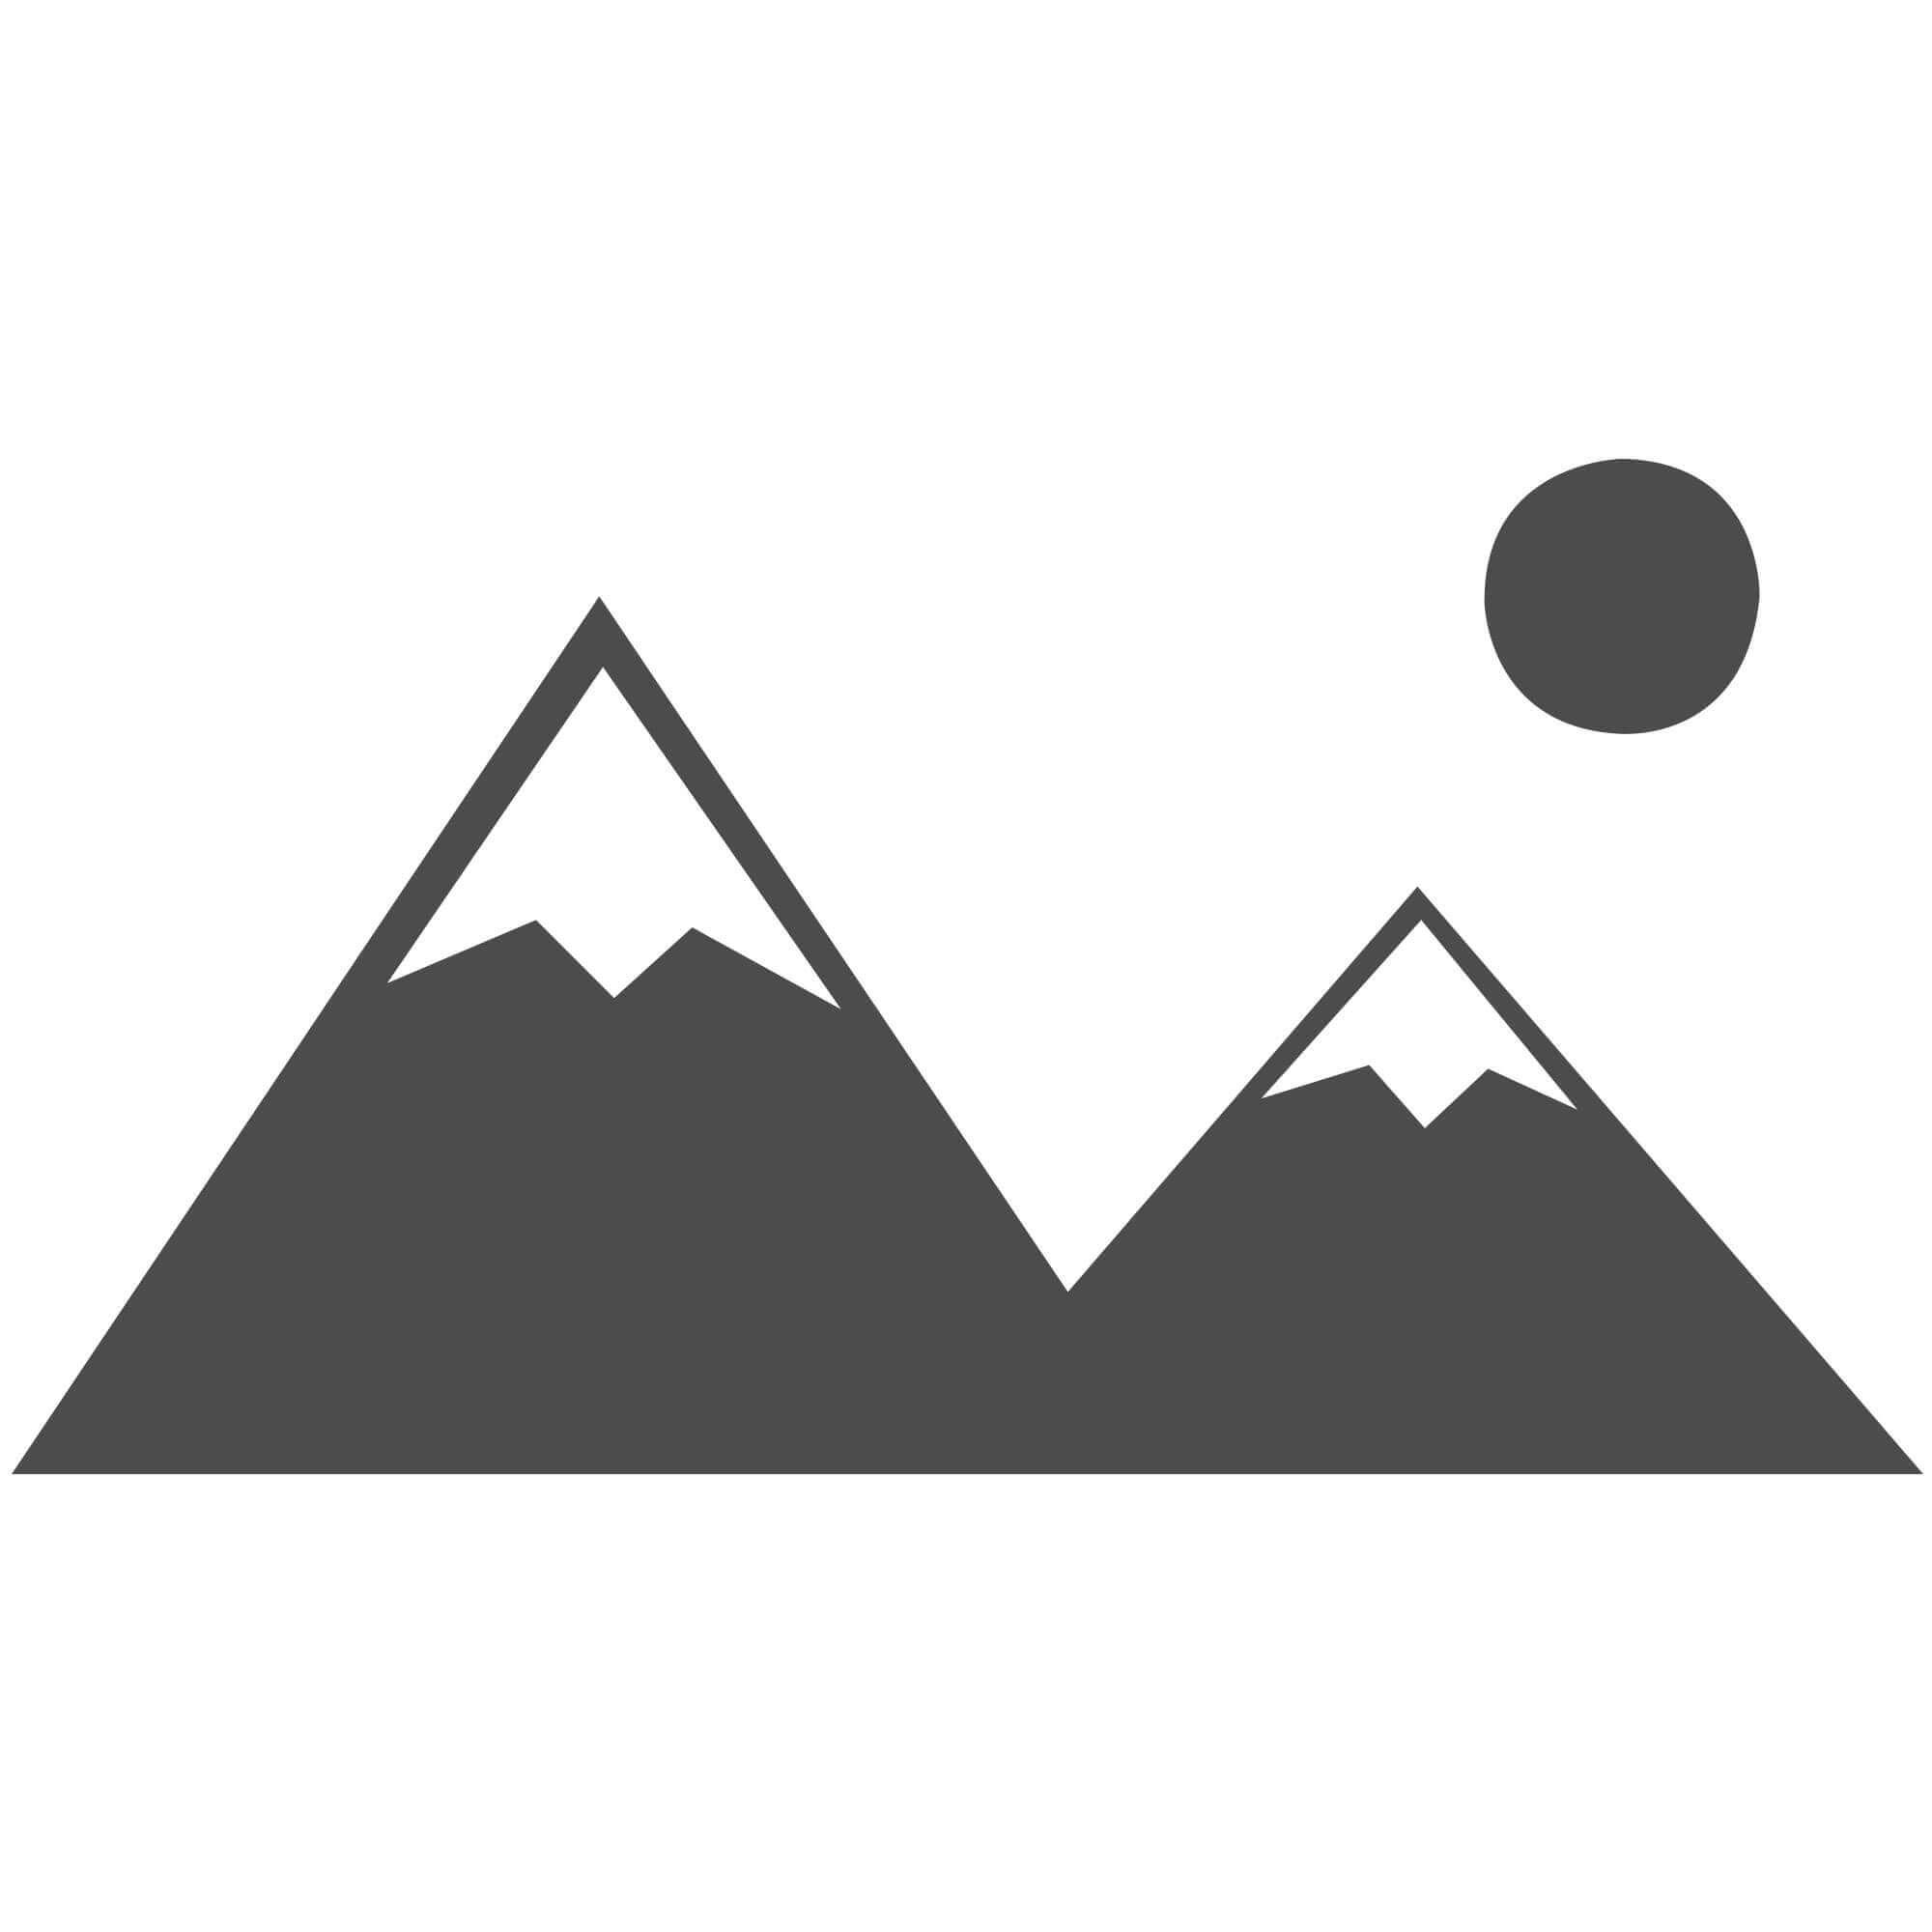 "Verge Furrow Terracotta Rug - Size 80 x 150 cm (2'8"" x 5')"